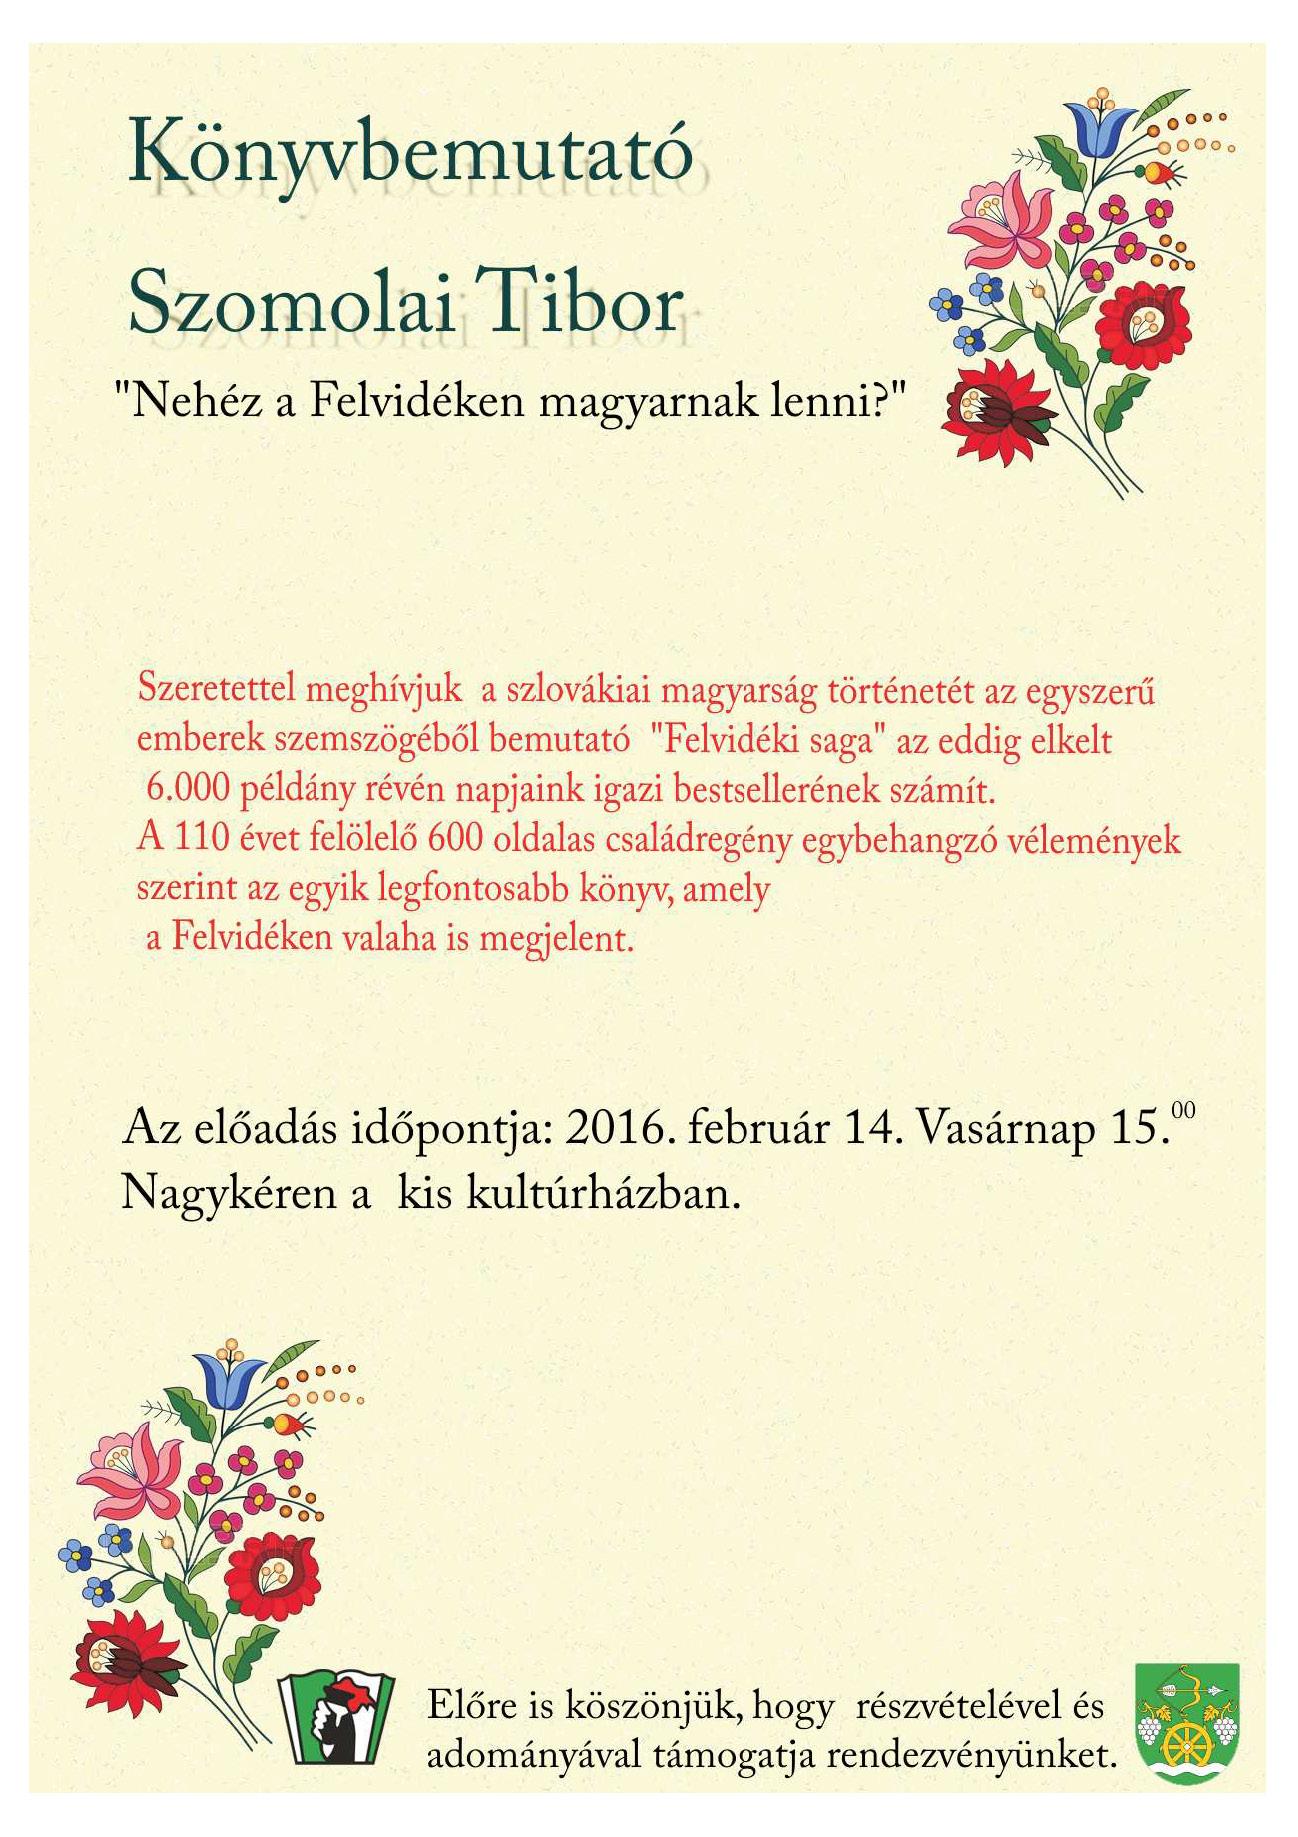 plakat_szomolai_tibor_konyv_20160214